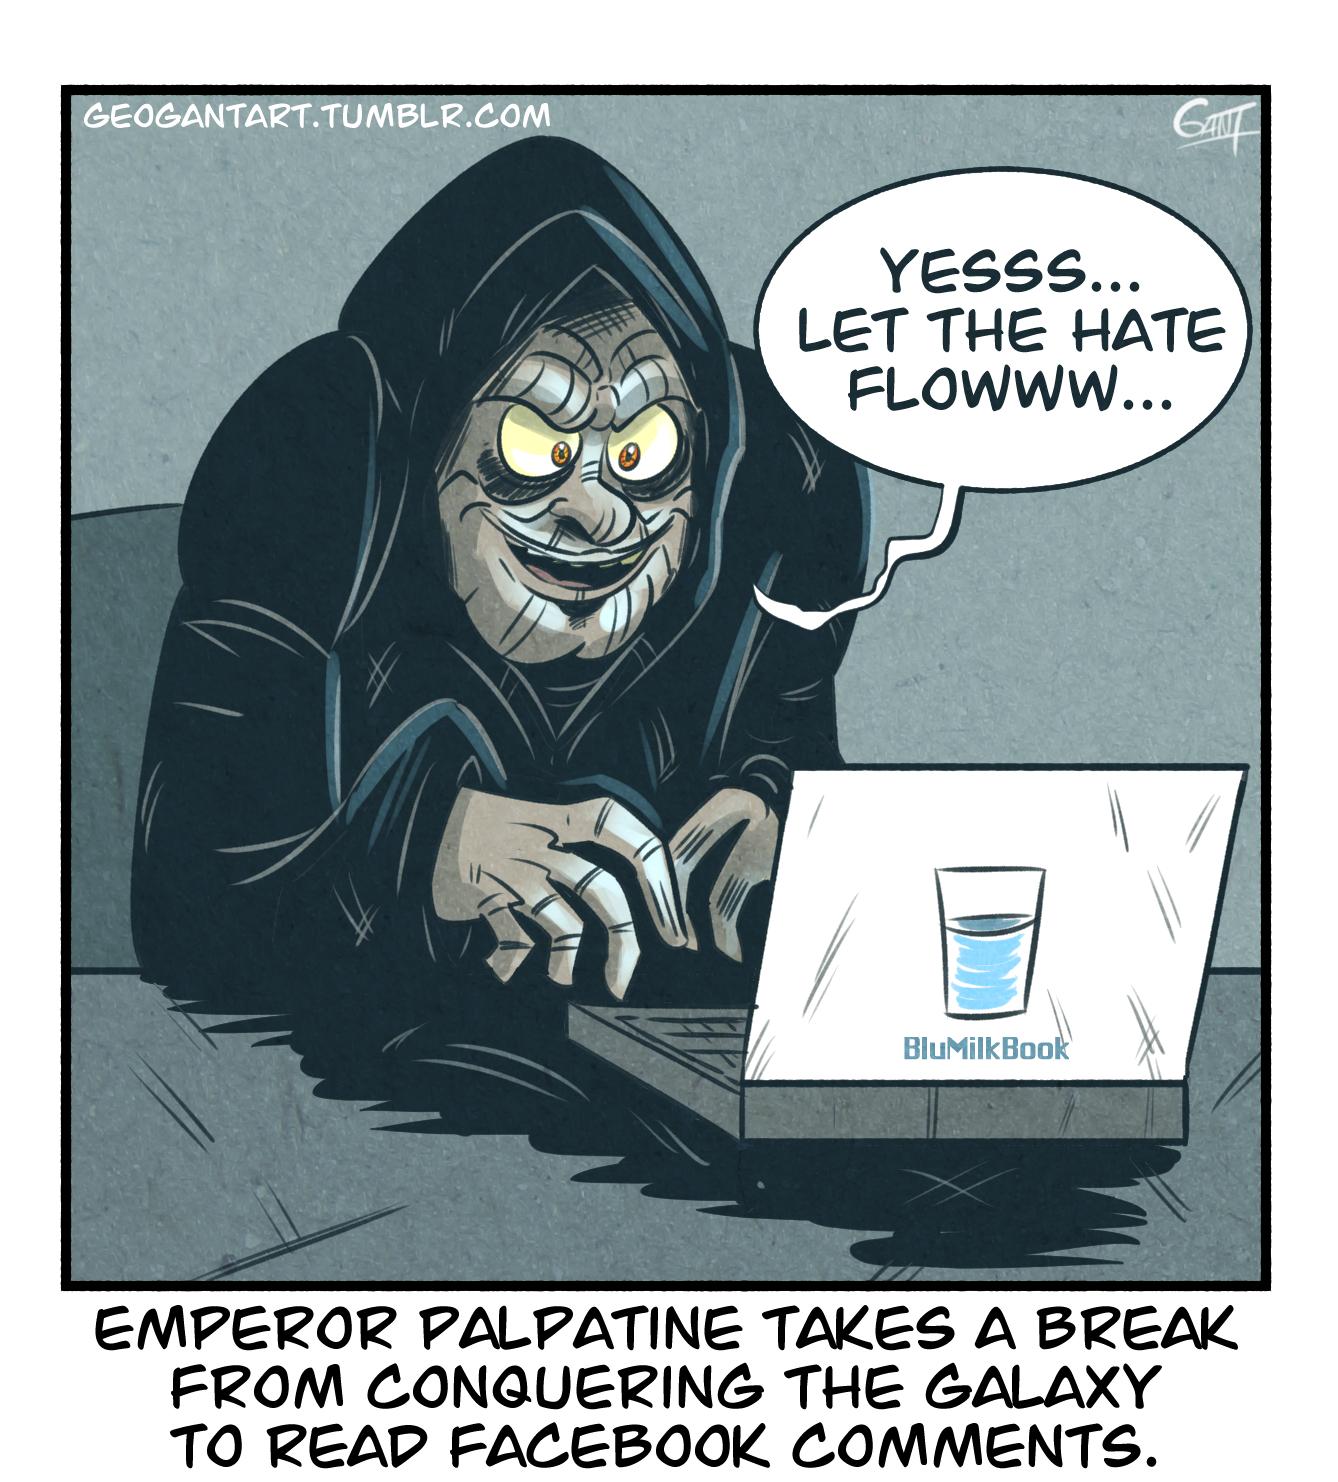 Palpatine Checks Facebook